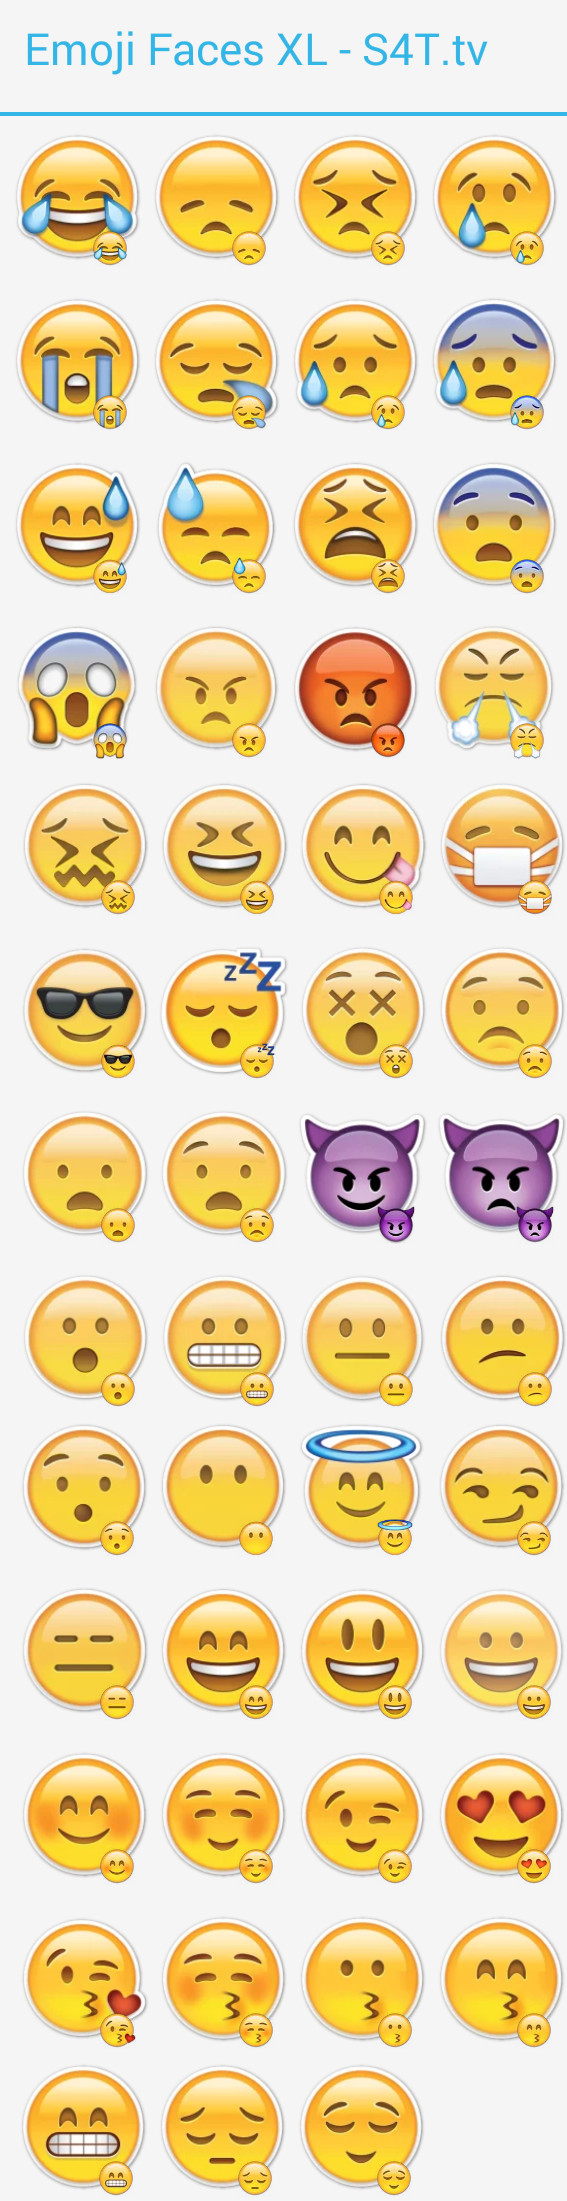 Faces Emoji XL